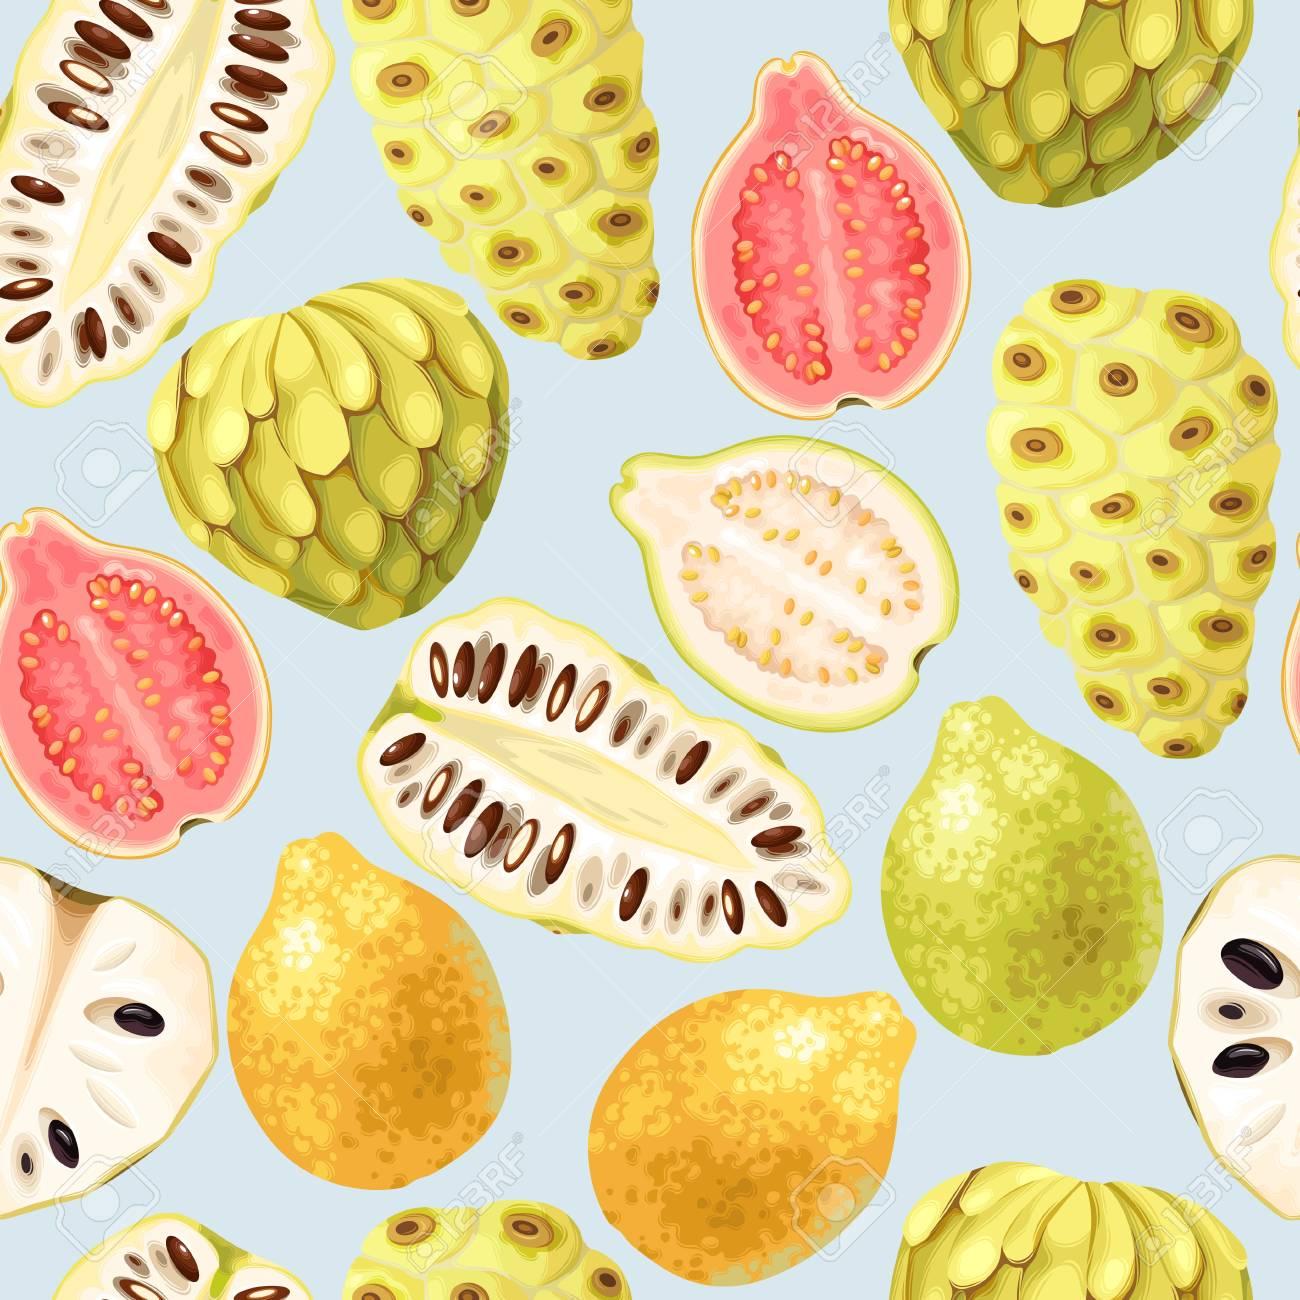 Cherimoya, noni and guava vector seamless background - 101043992